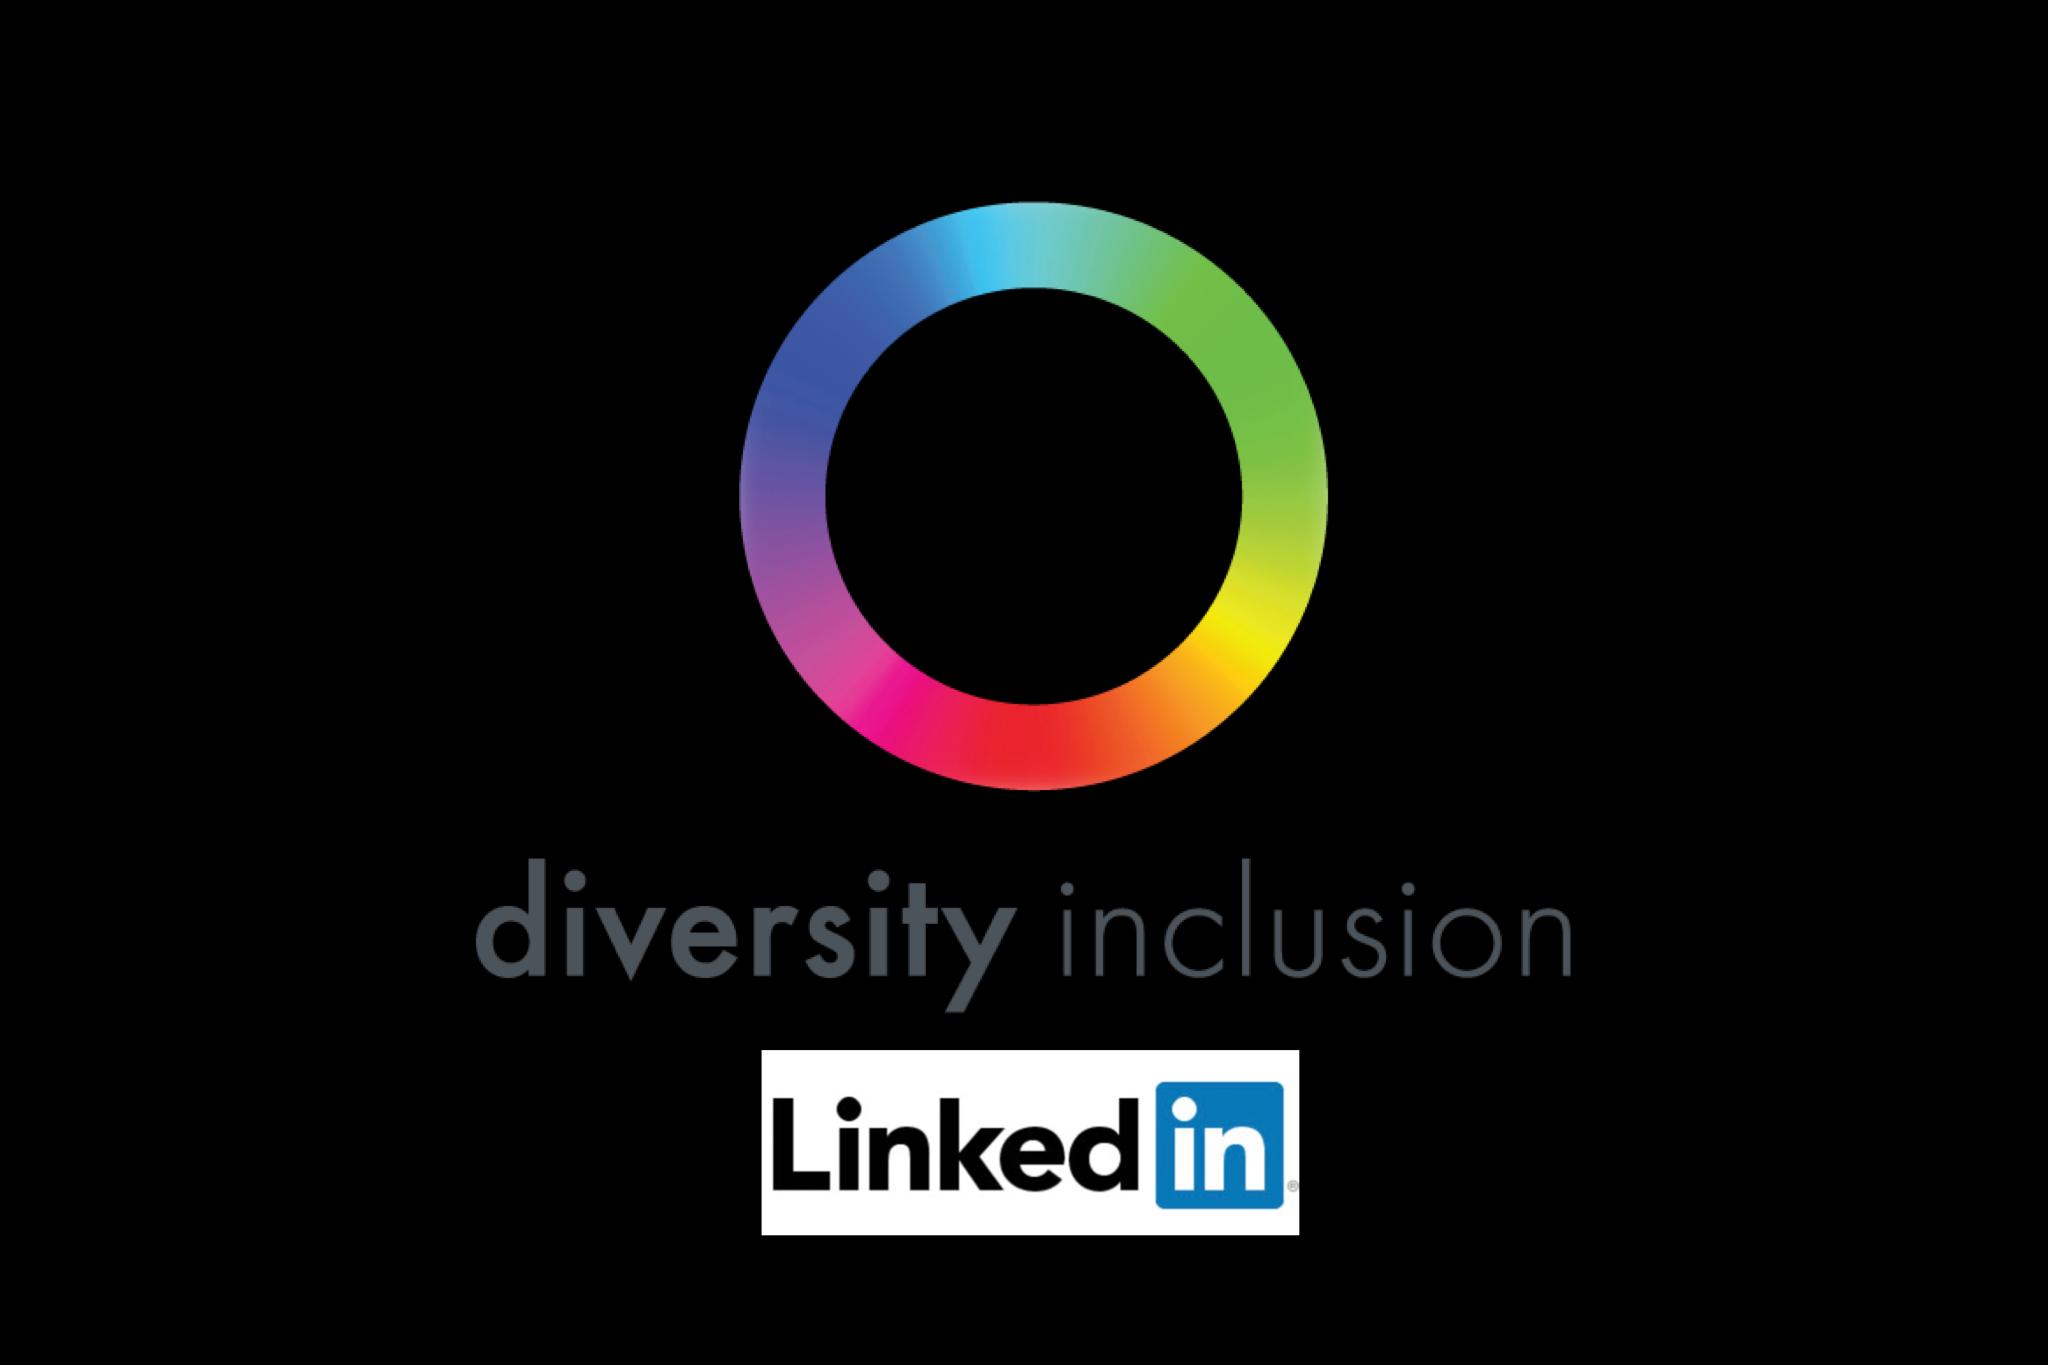 Diversity & Inclusion on LinkedIn